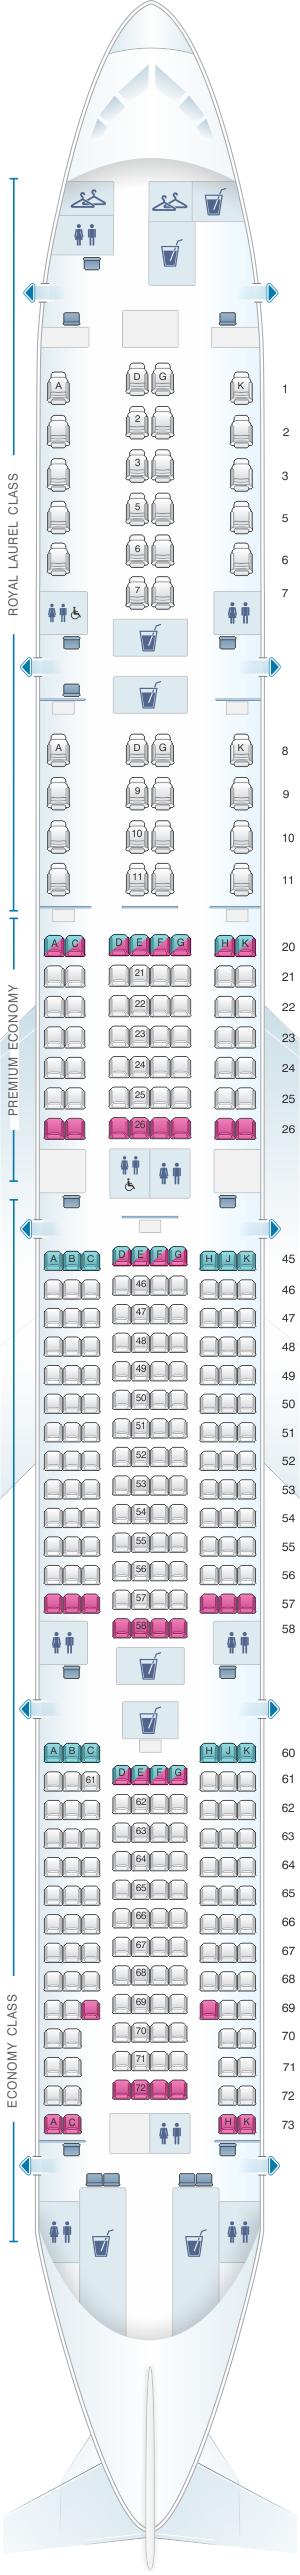 Seat map for EVA Air Boeing B777 300ER 353PAX